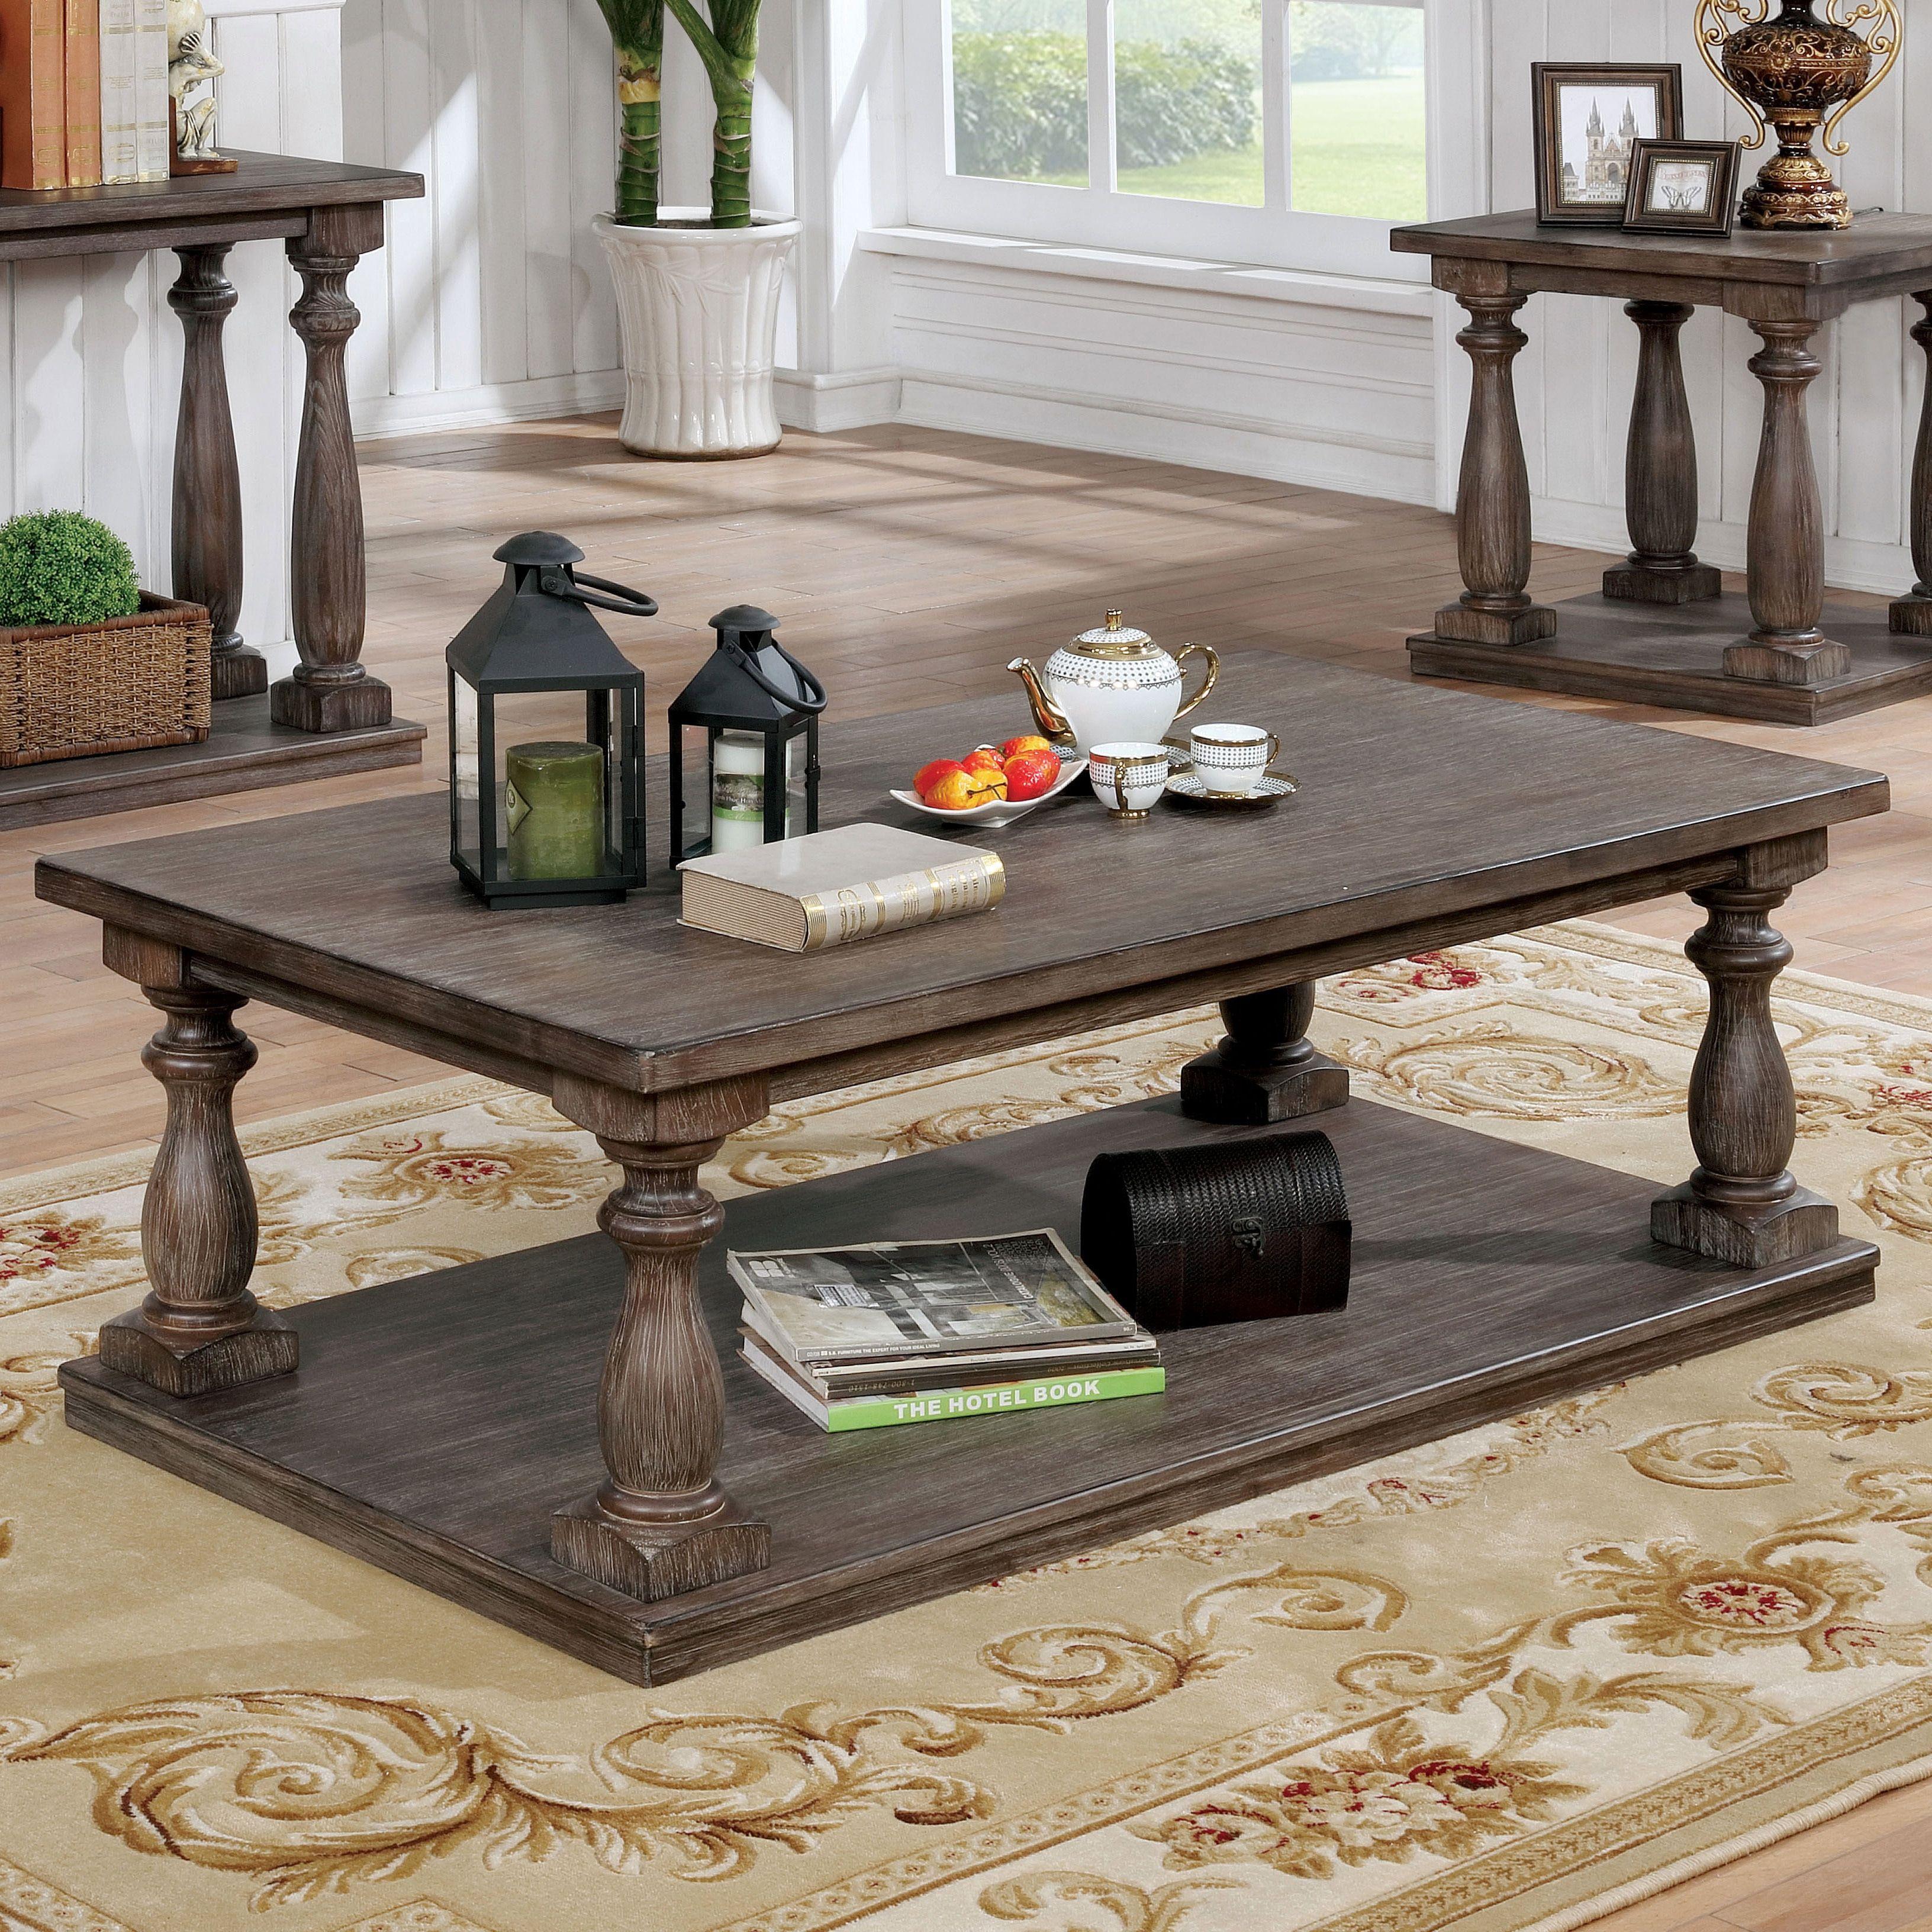 Rustic Coffee Table Wood Coffee Table Rustic Pine Coffee Table Coffee Table Wood [ 4032 x 3024 Pixel ]